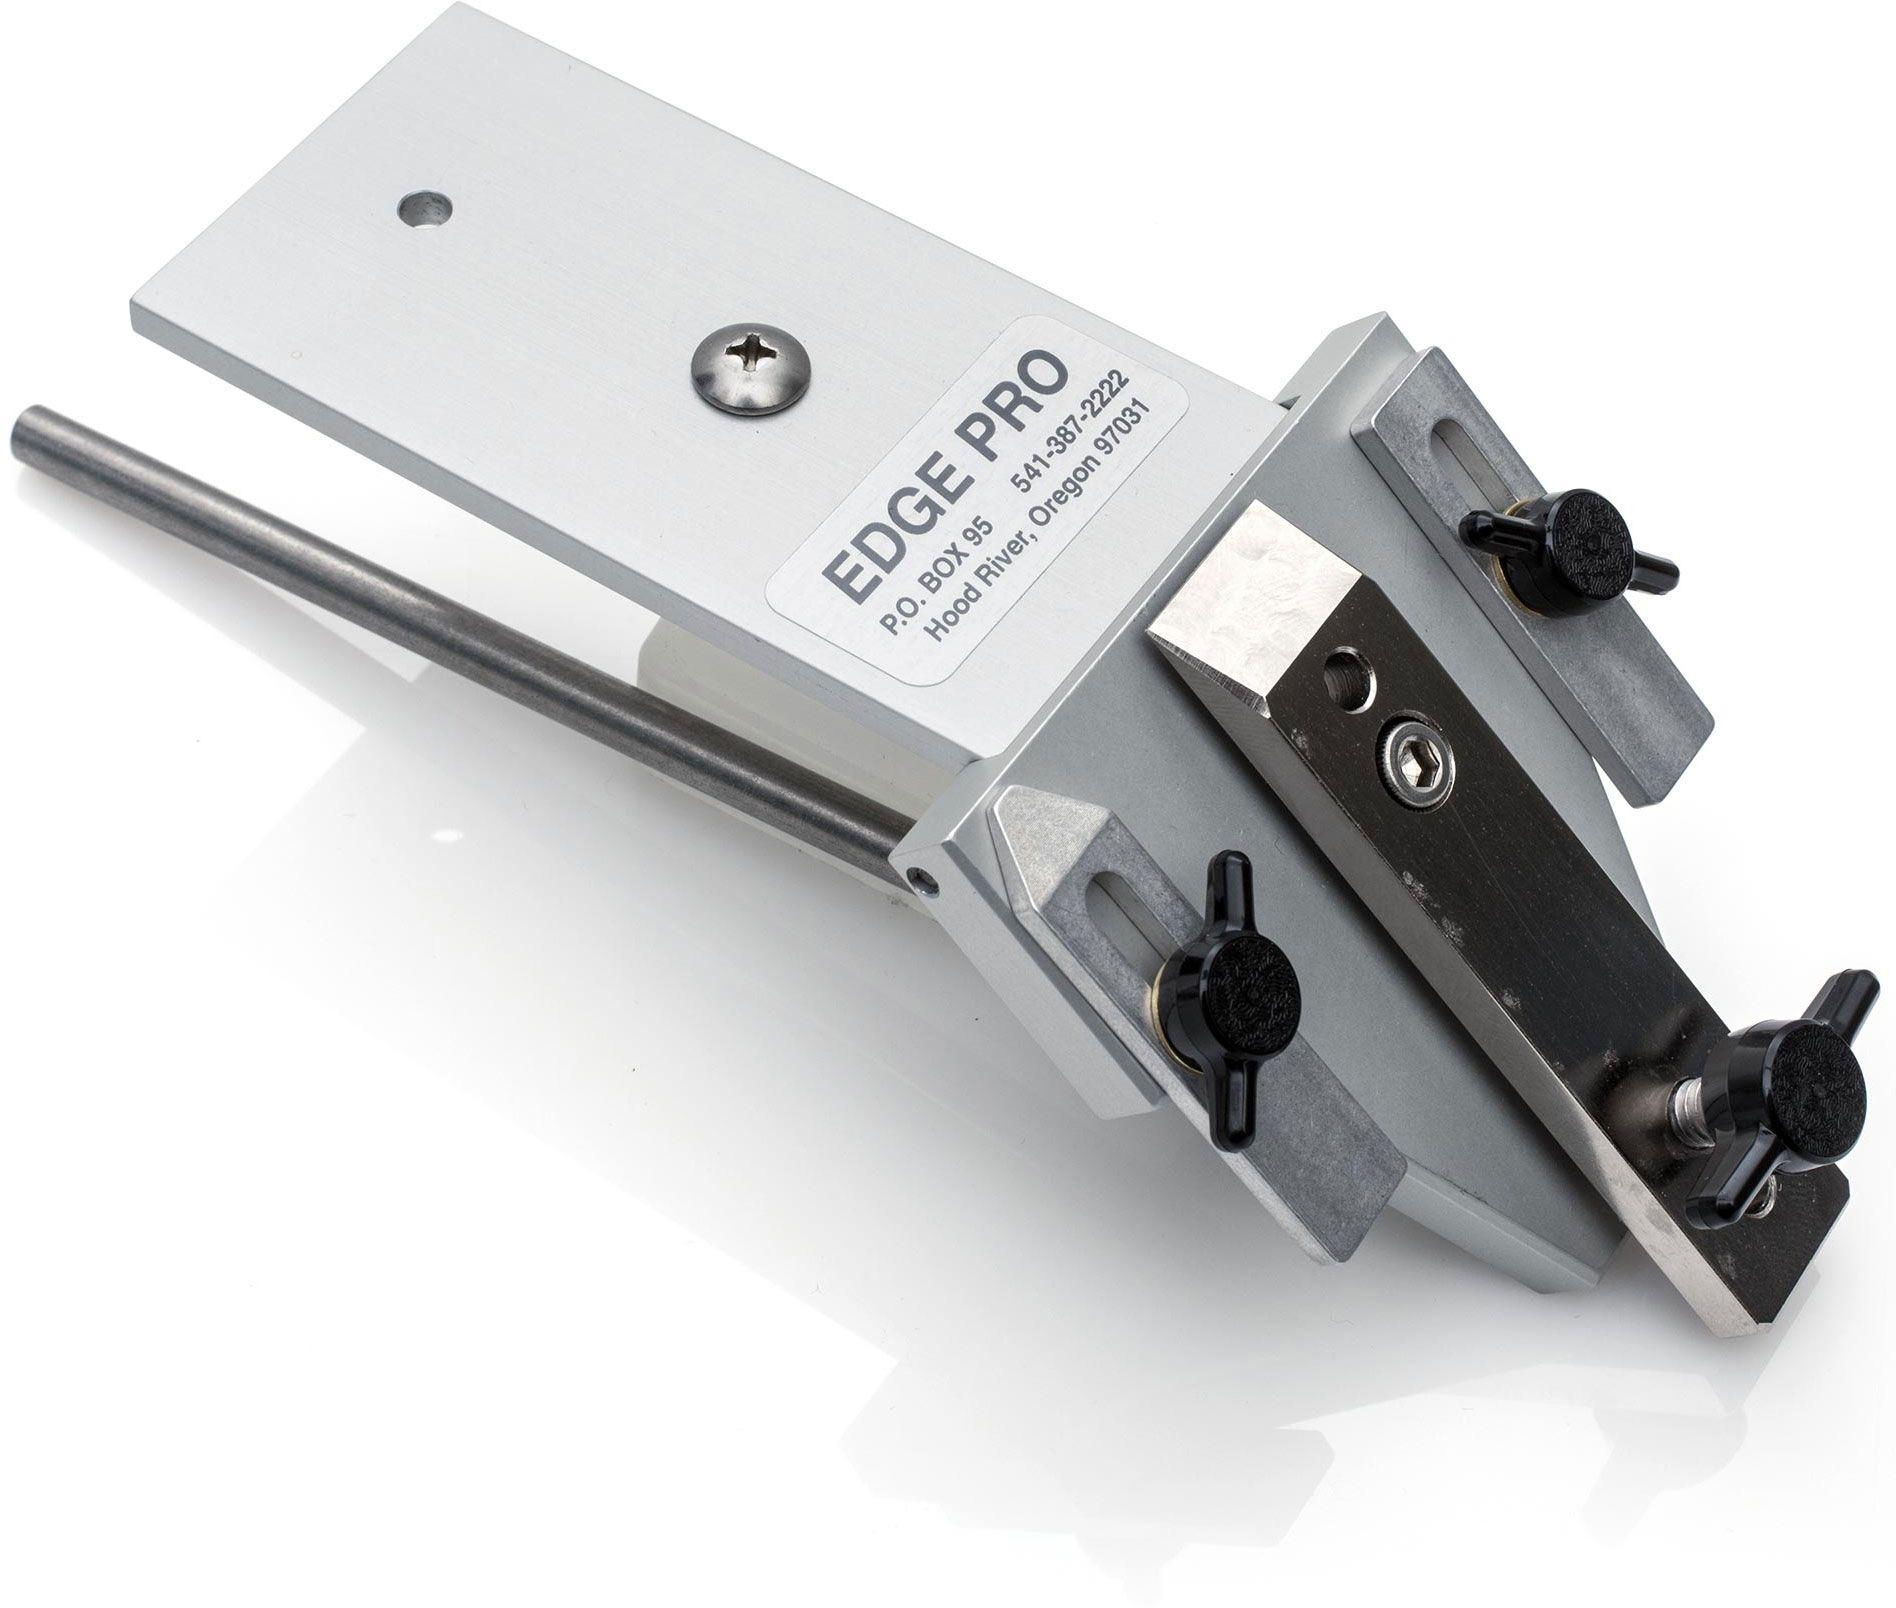 Edge Pro Scissor Sharpening Attachment